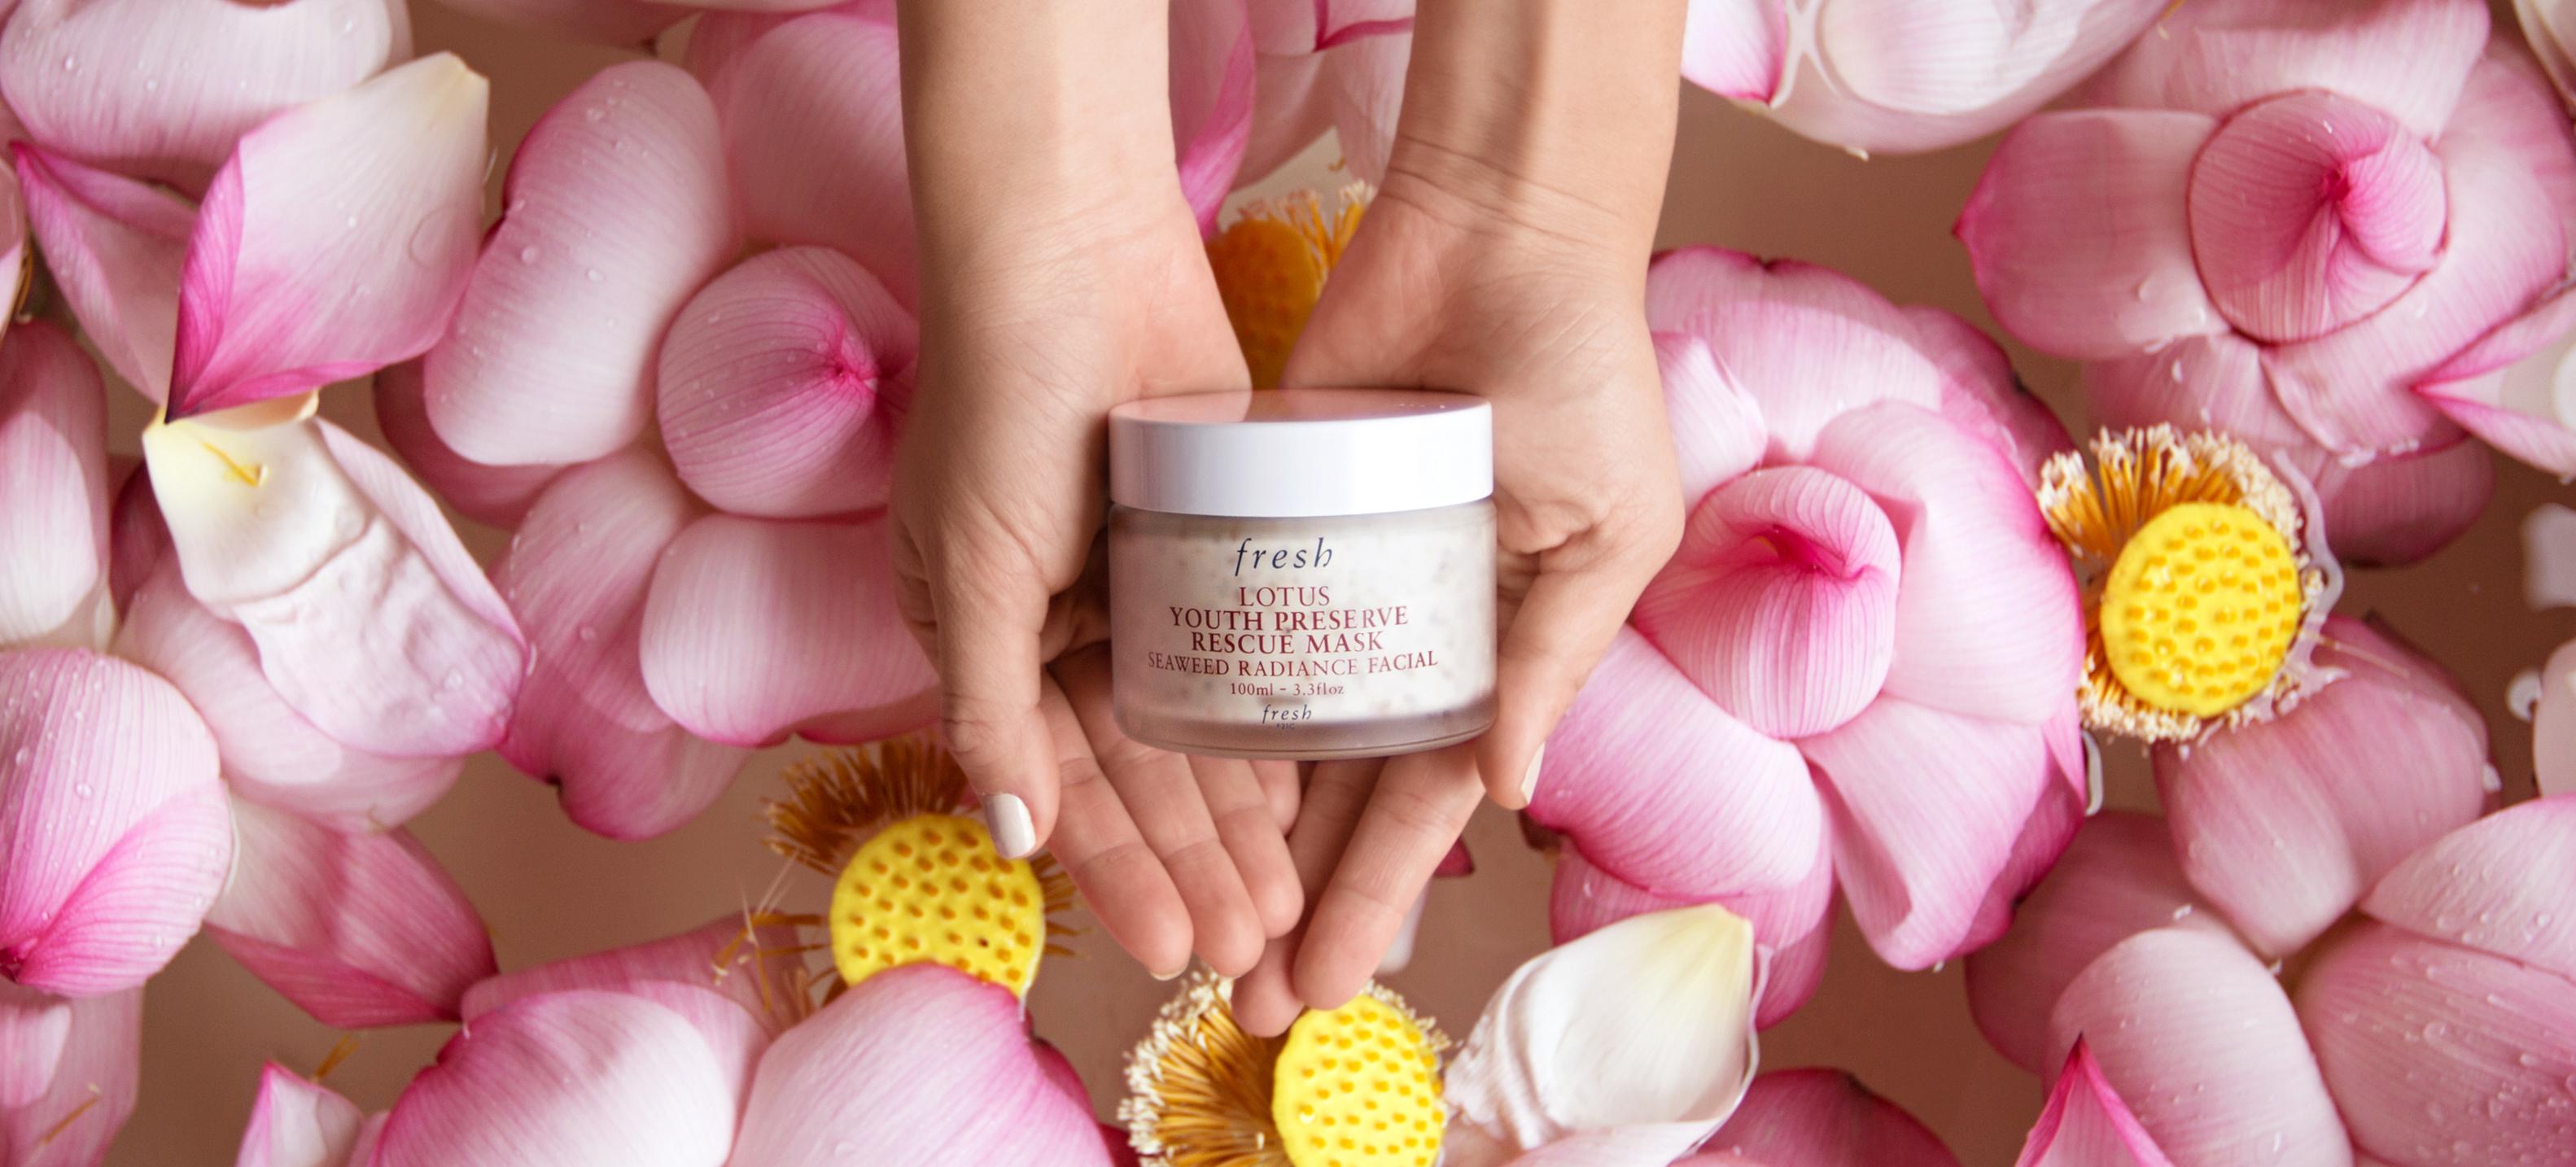 Our Take On Freshs Lotus 5 Minute Facial In A Jar Mask Nylon